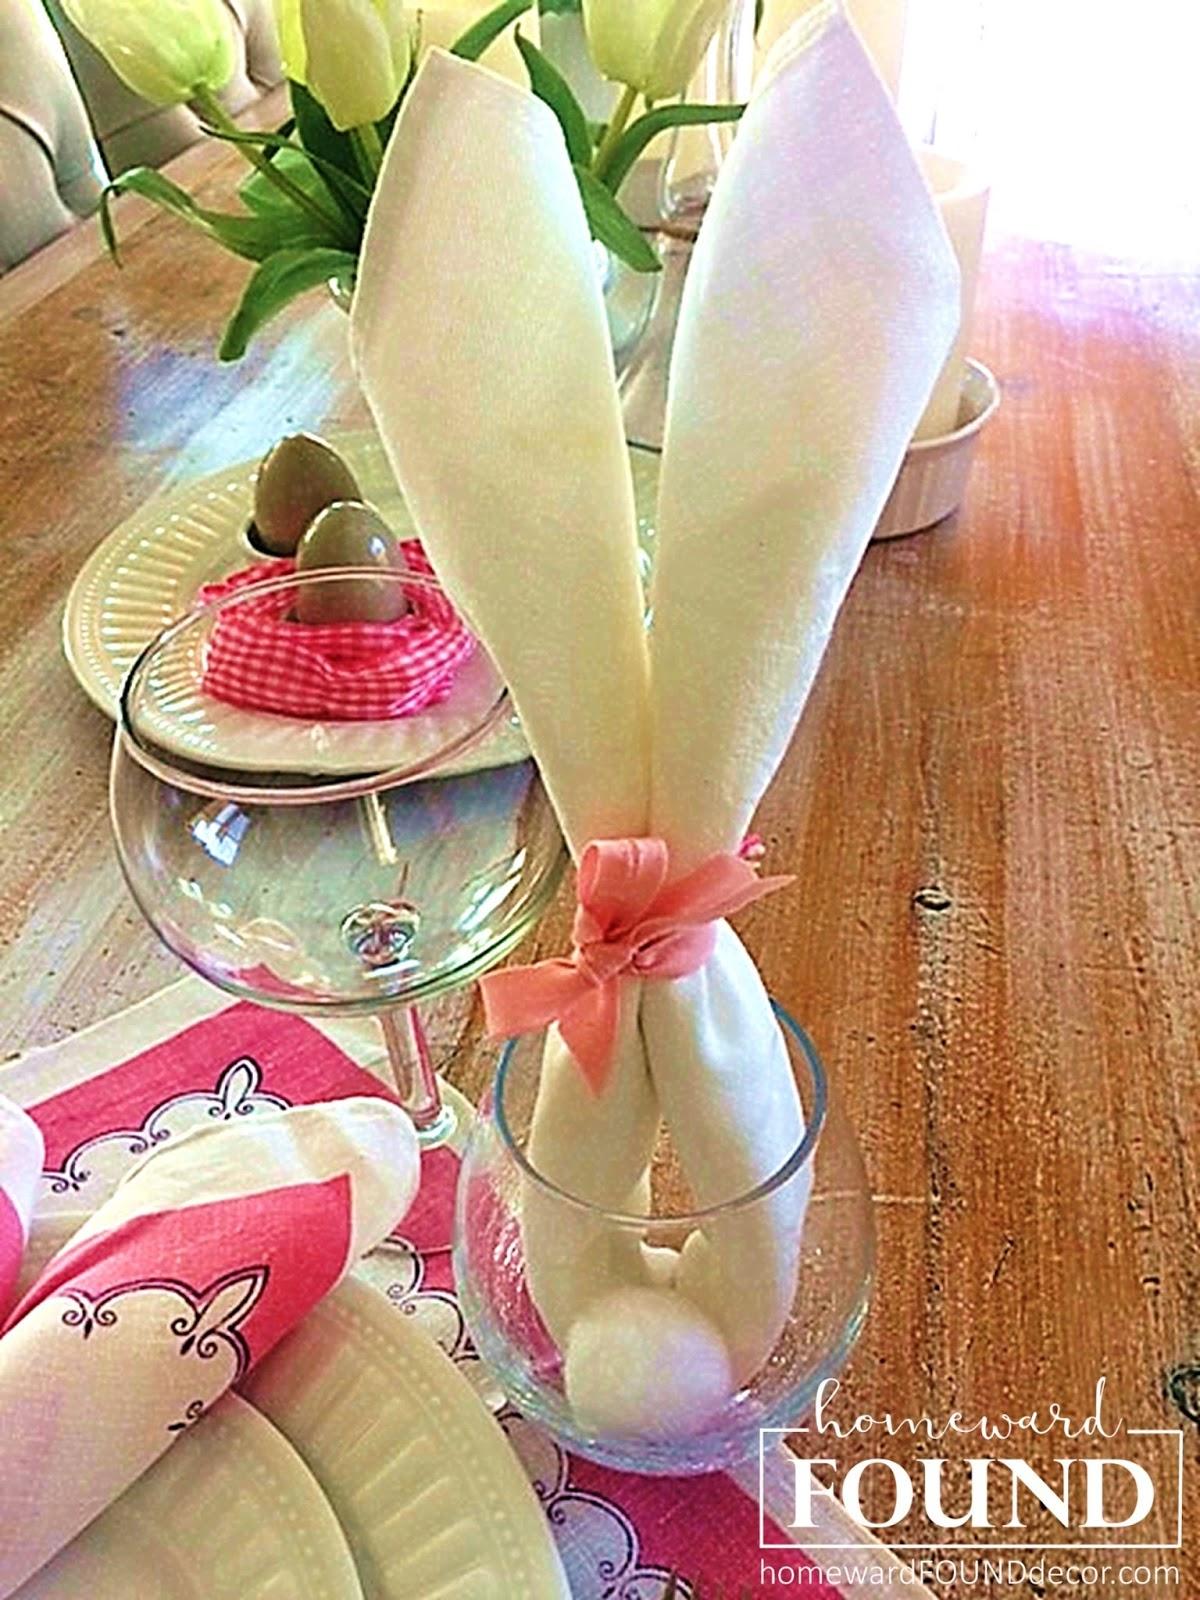 thrifty weekend makeover part i homewardfound decor.htm tutorial  bunny ears  napkins  homewardfound decor  tutorial  bunny ears  napkins